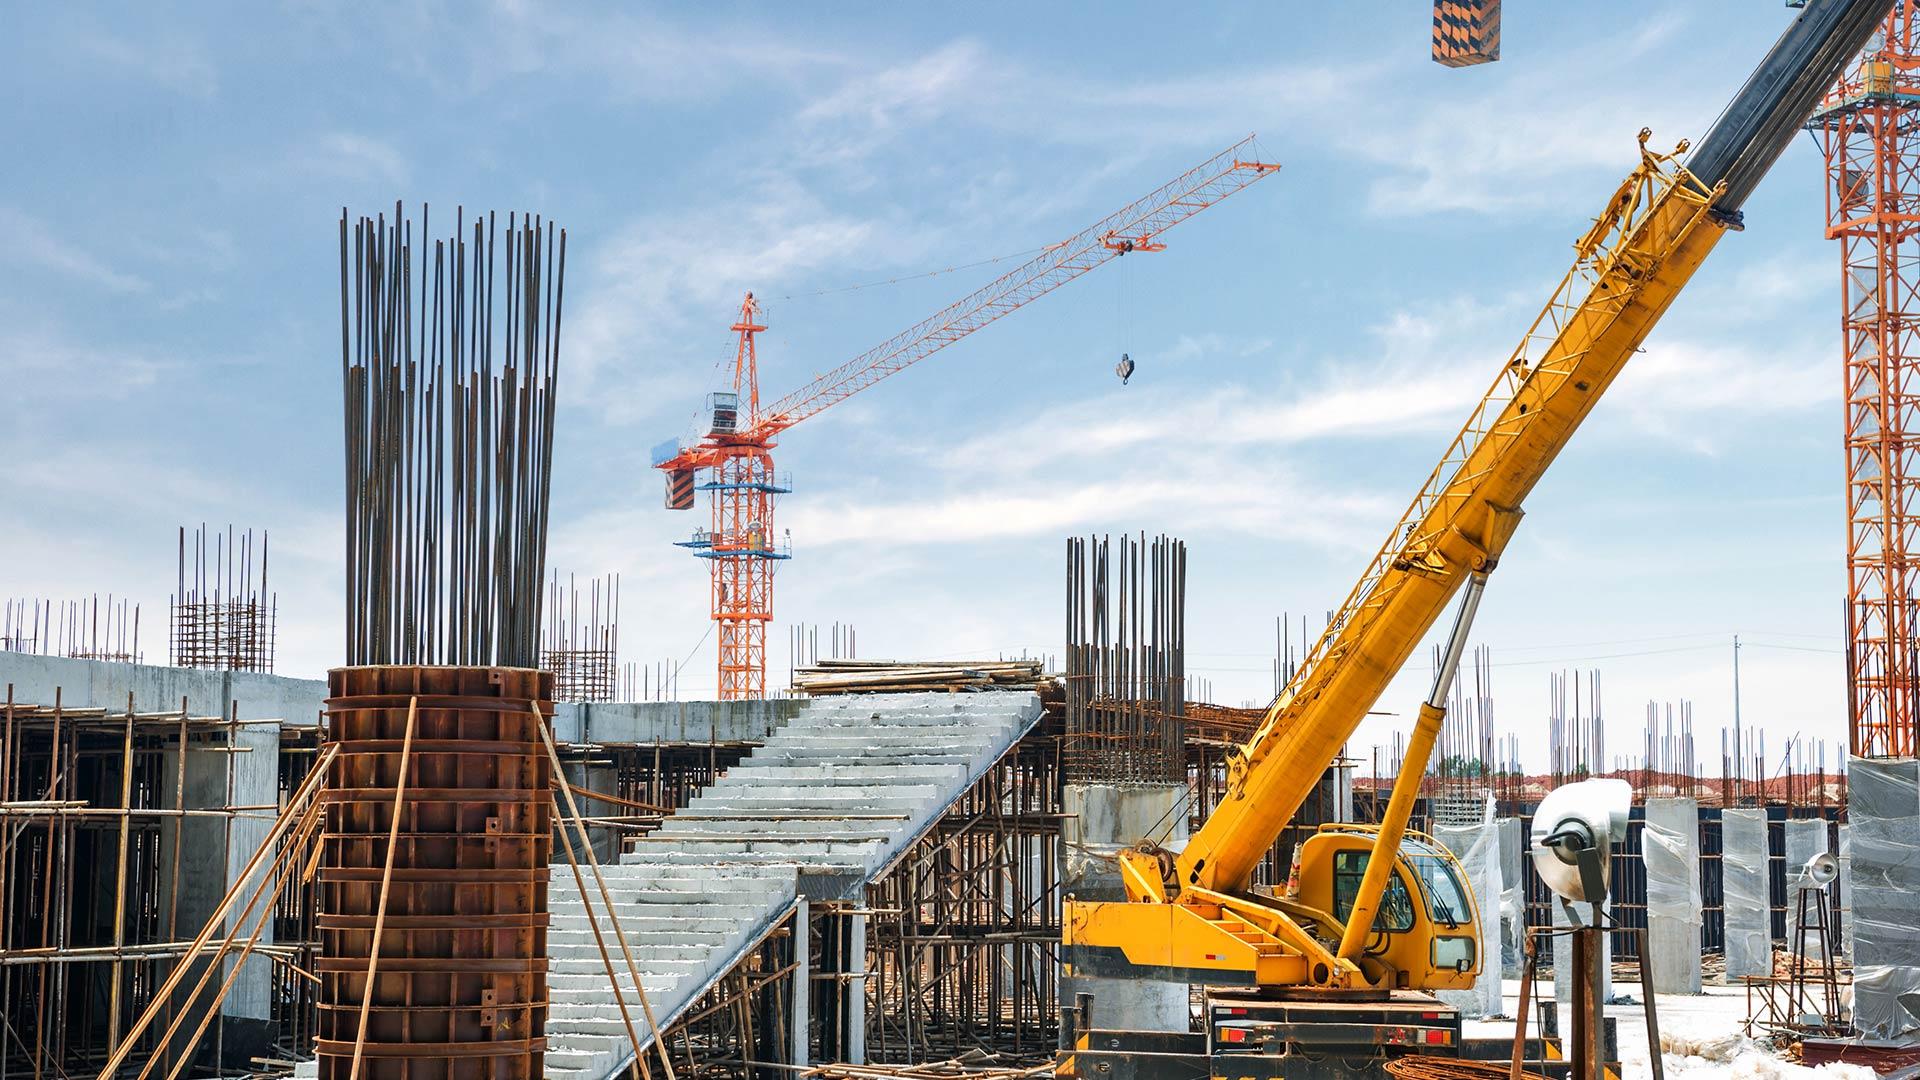 Africa under construction